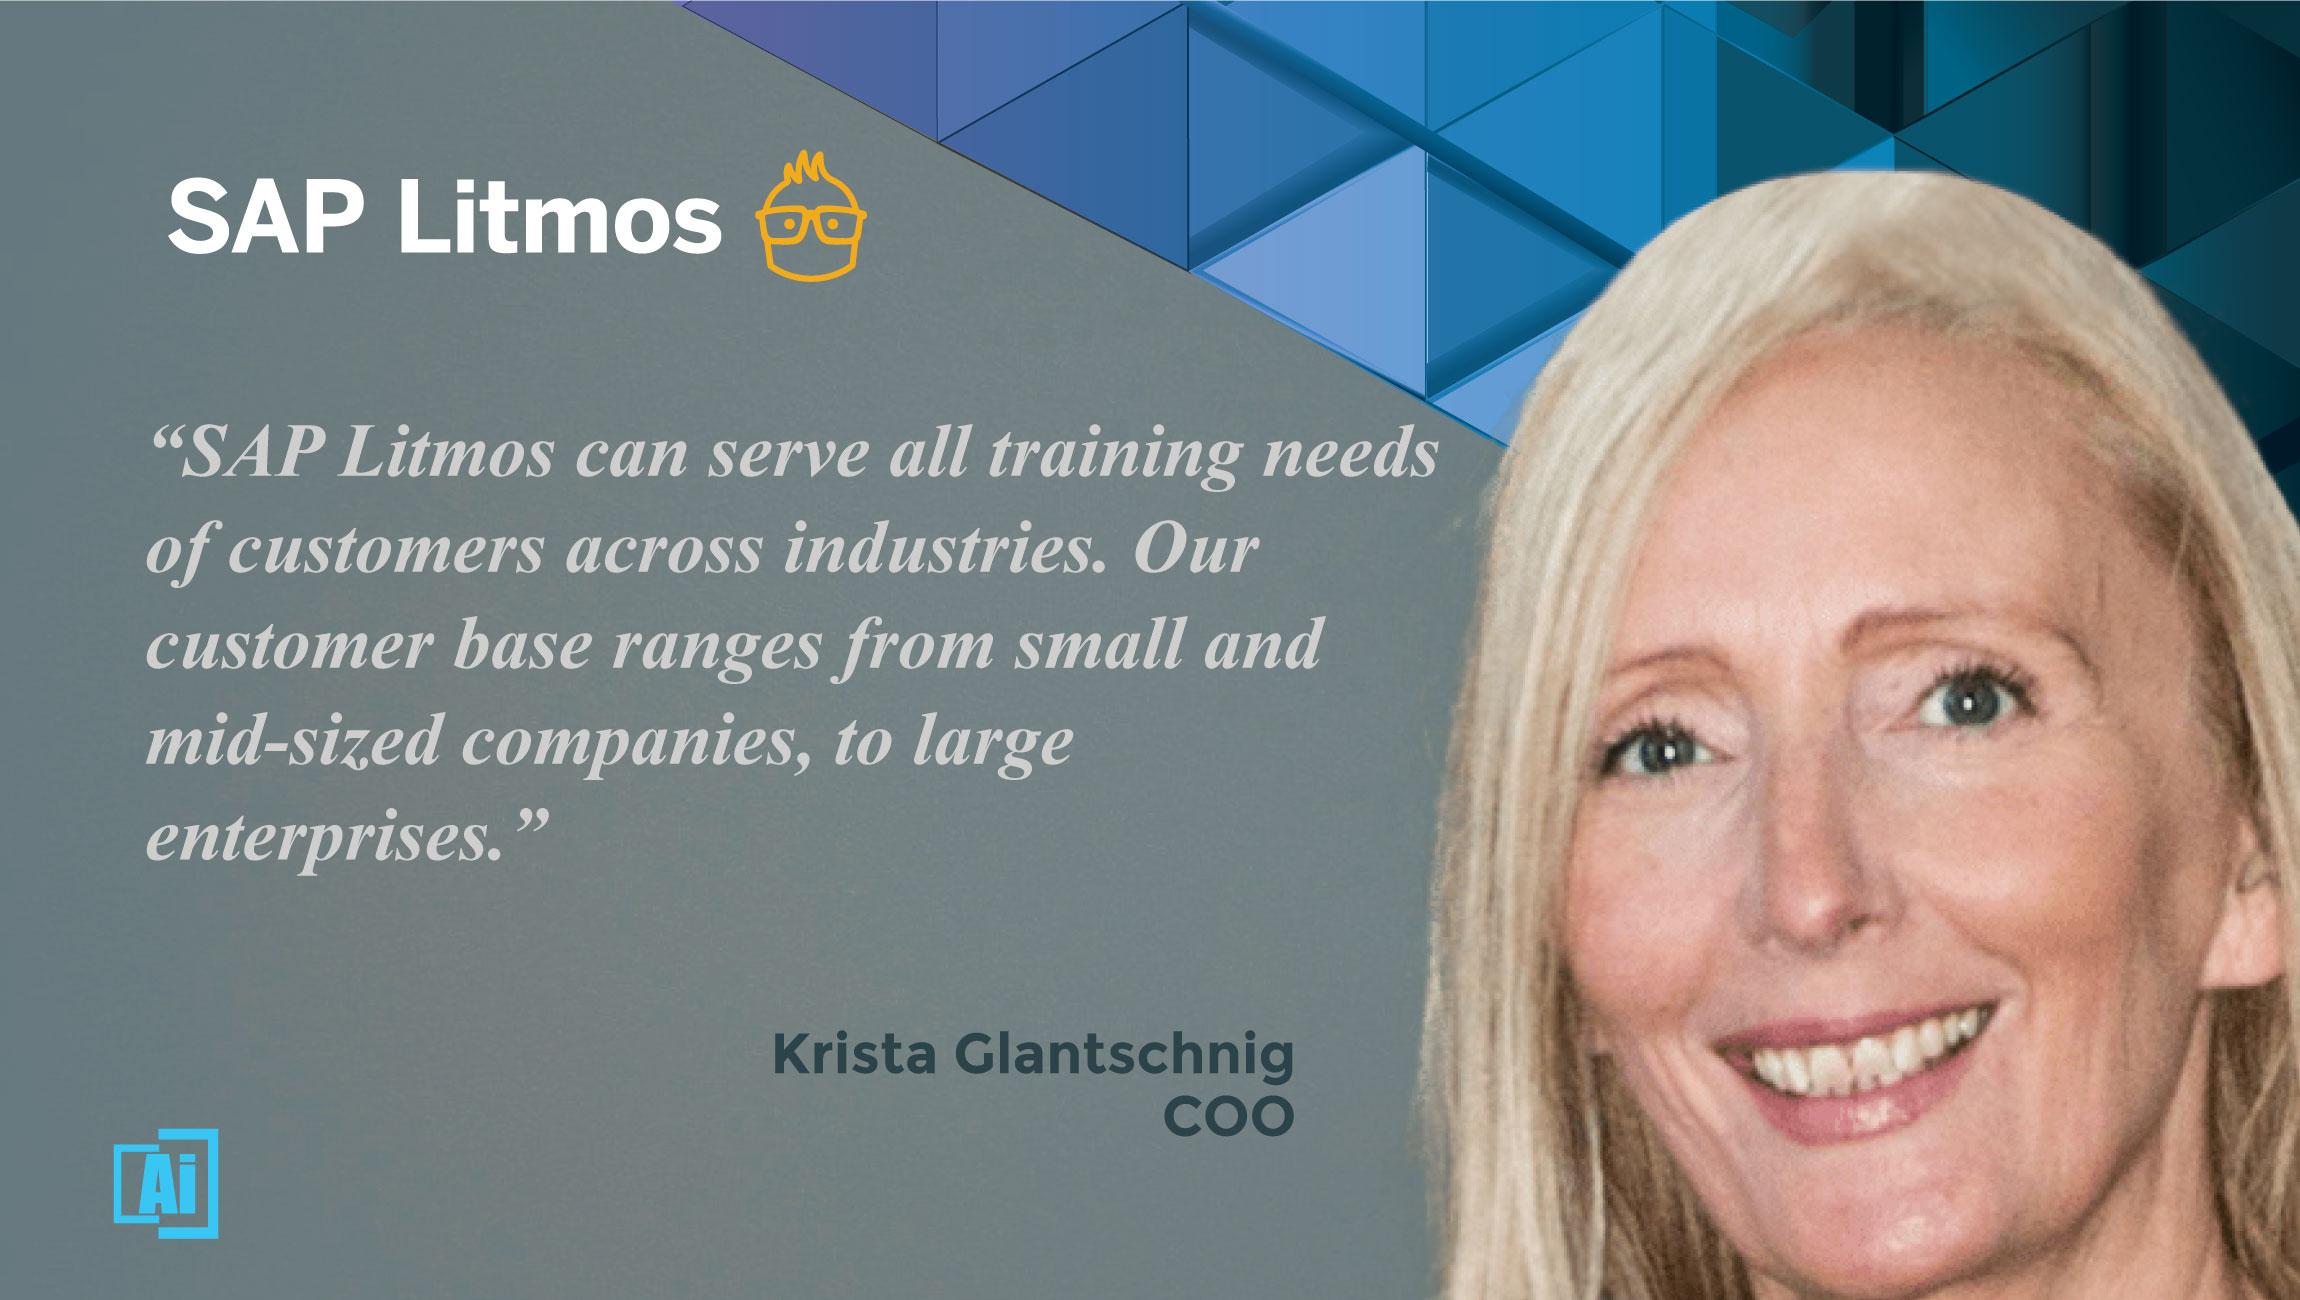 AiThority Interview With Krista Glantschnig, COO at SAP Litmos